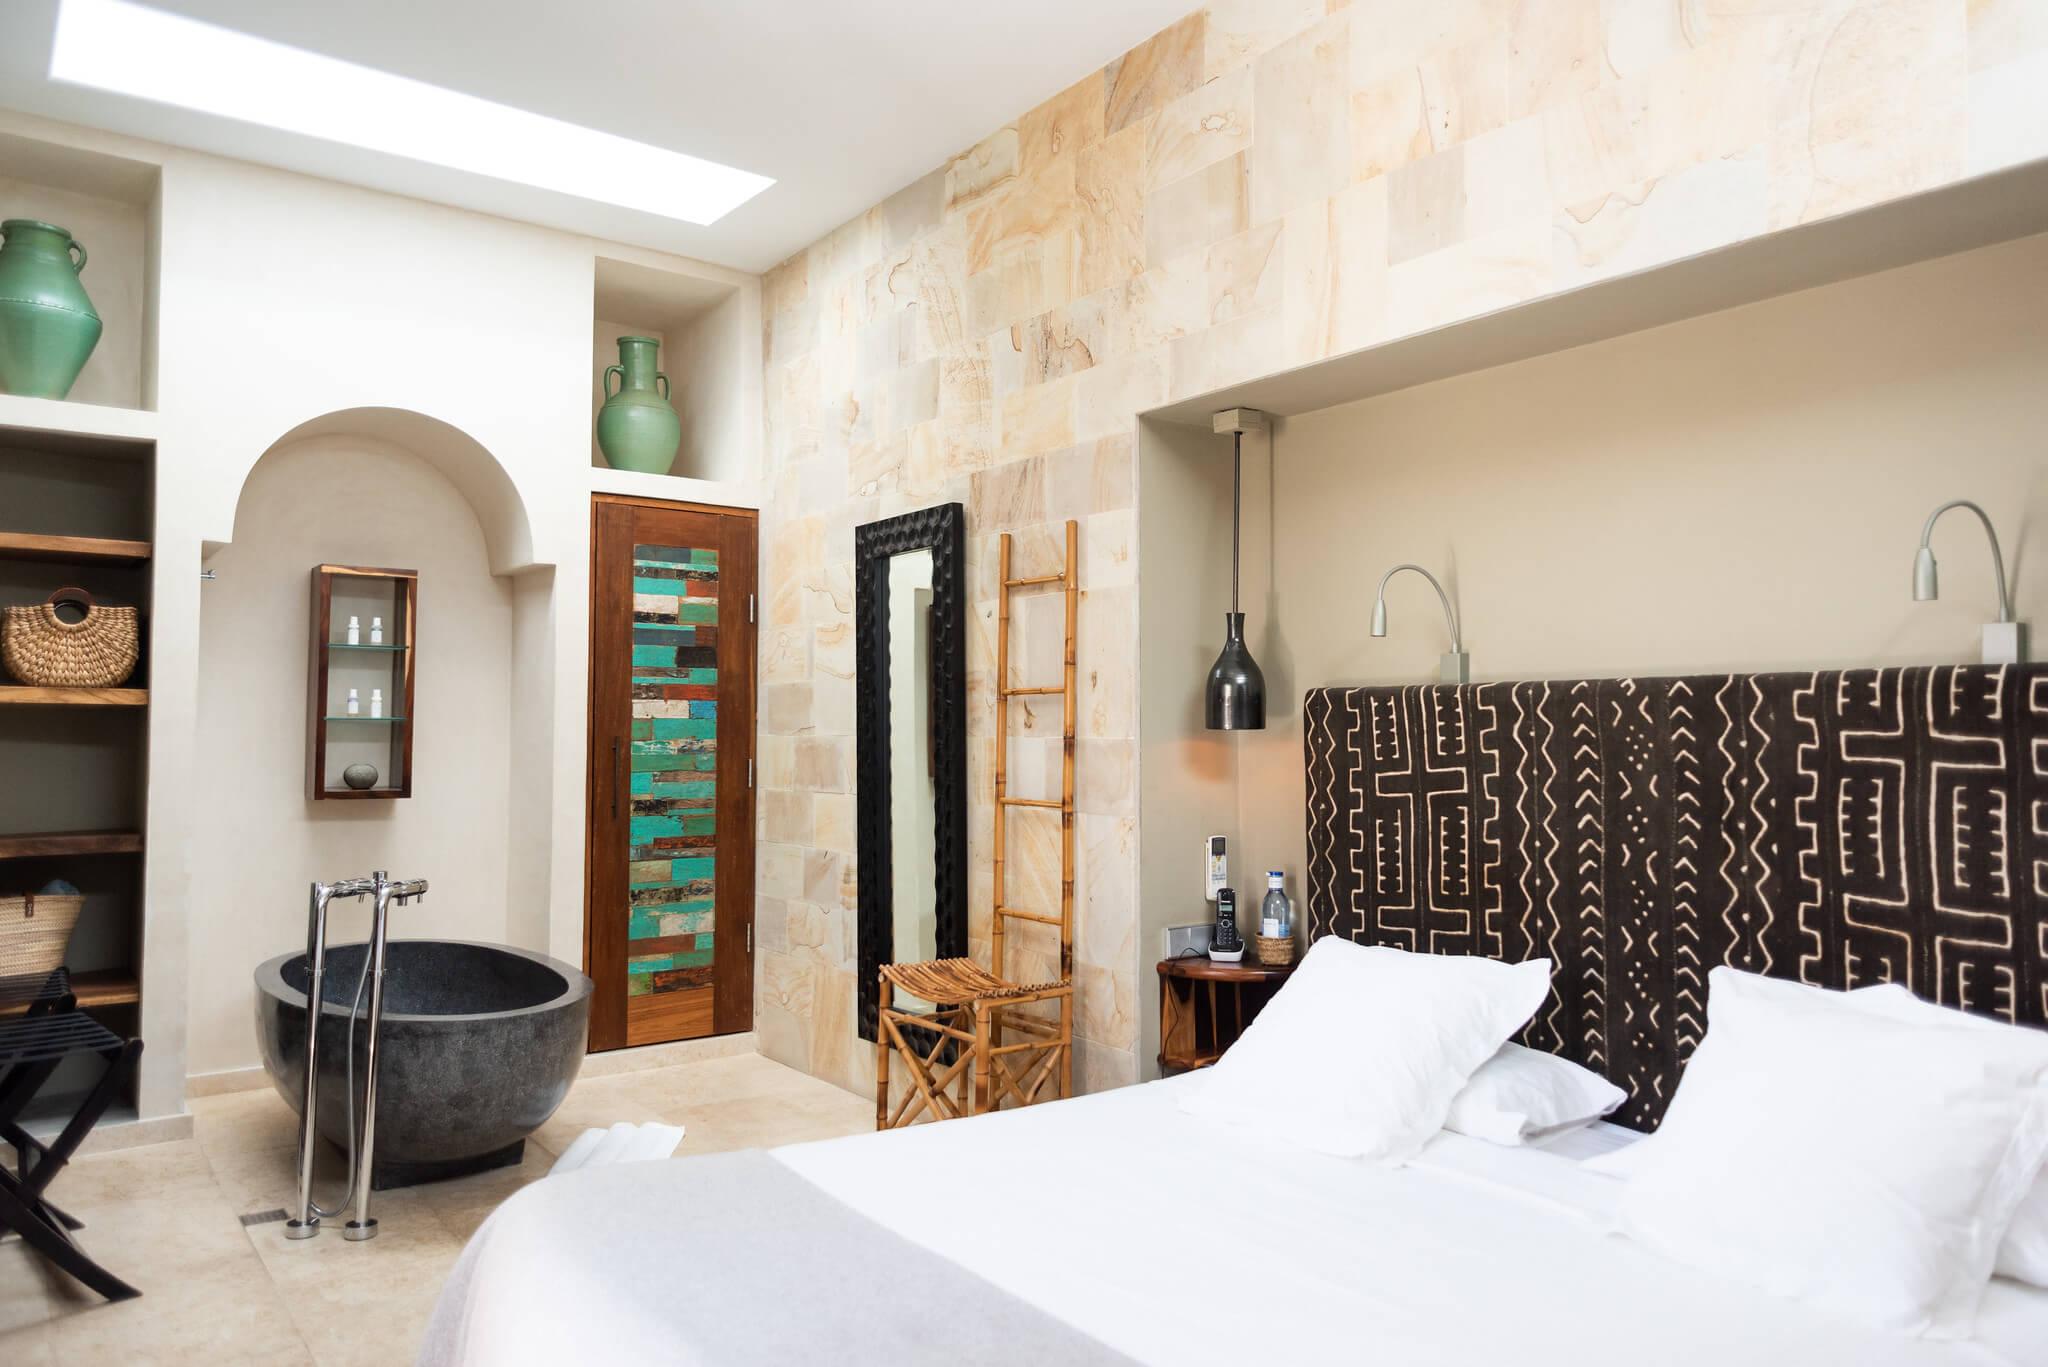 https://www.white-ibiza.com/wp-content/uploads/2020/03/white-ibiza-boutique-hotels-the-giri-residence-2020-01.jpg